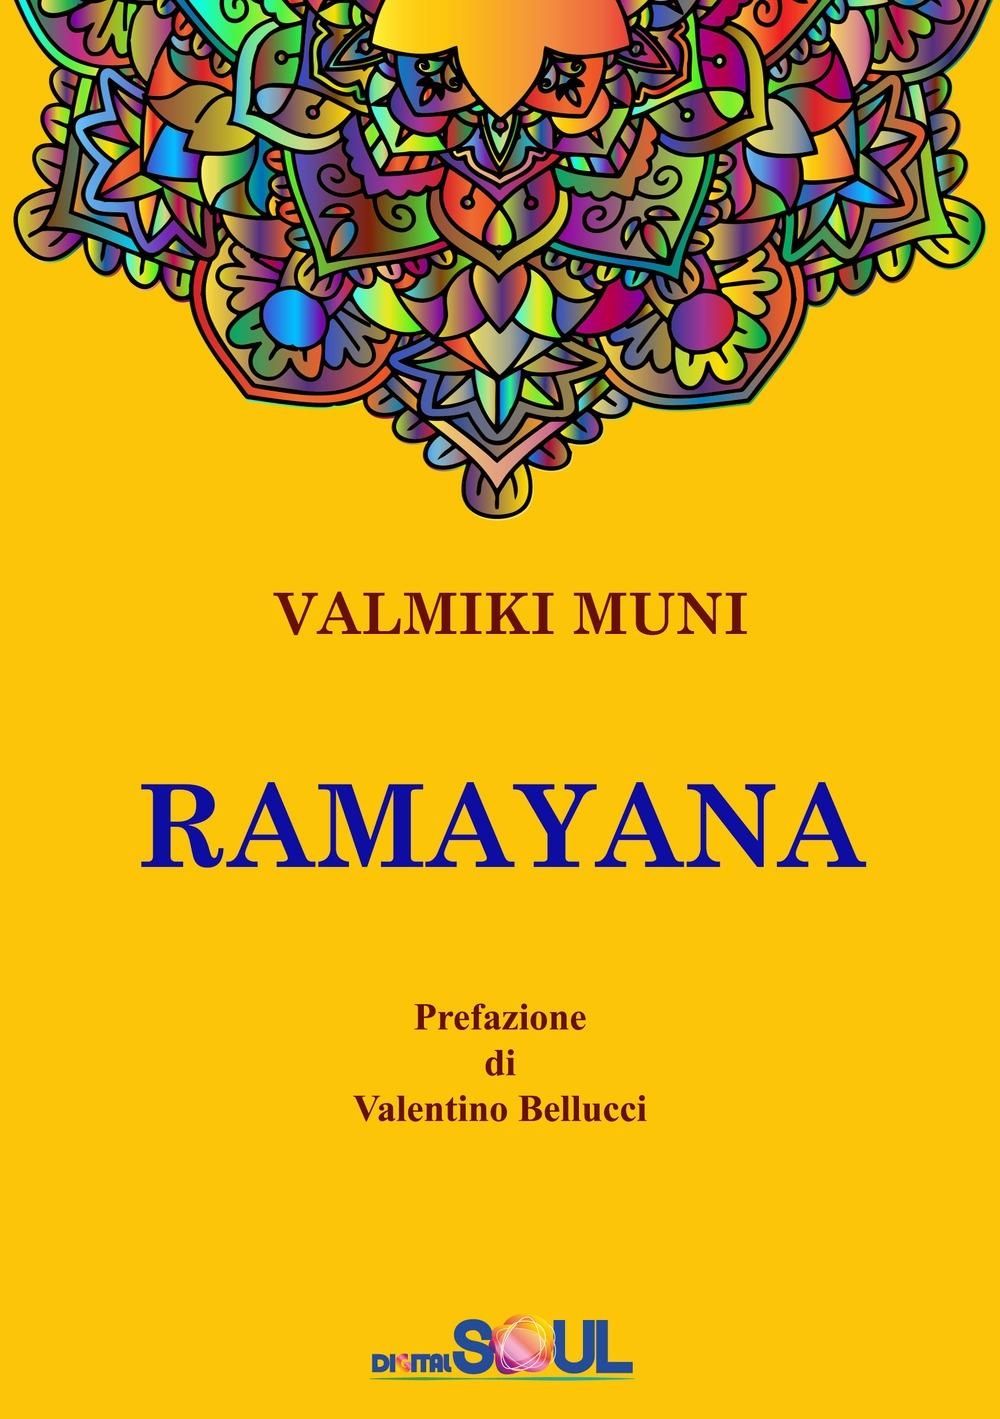 Ramayana. La storia dell'Avatara Sri Rama